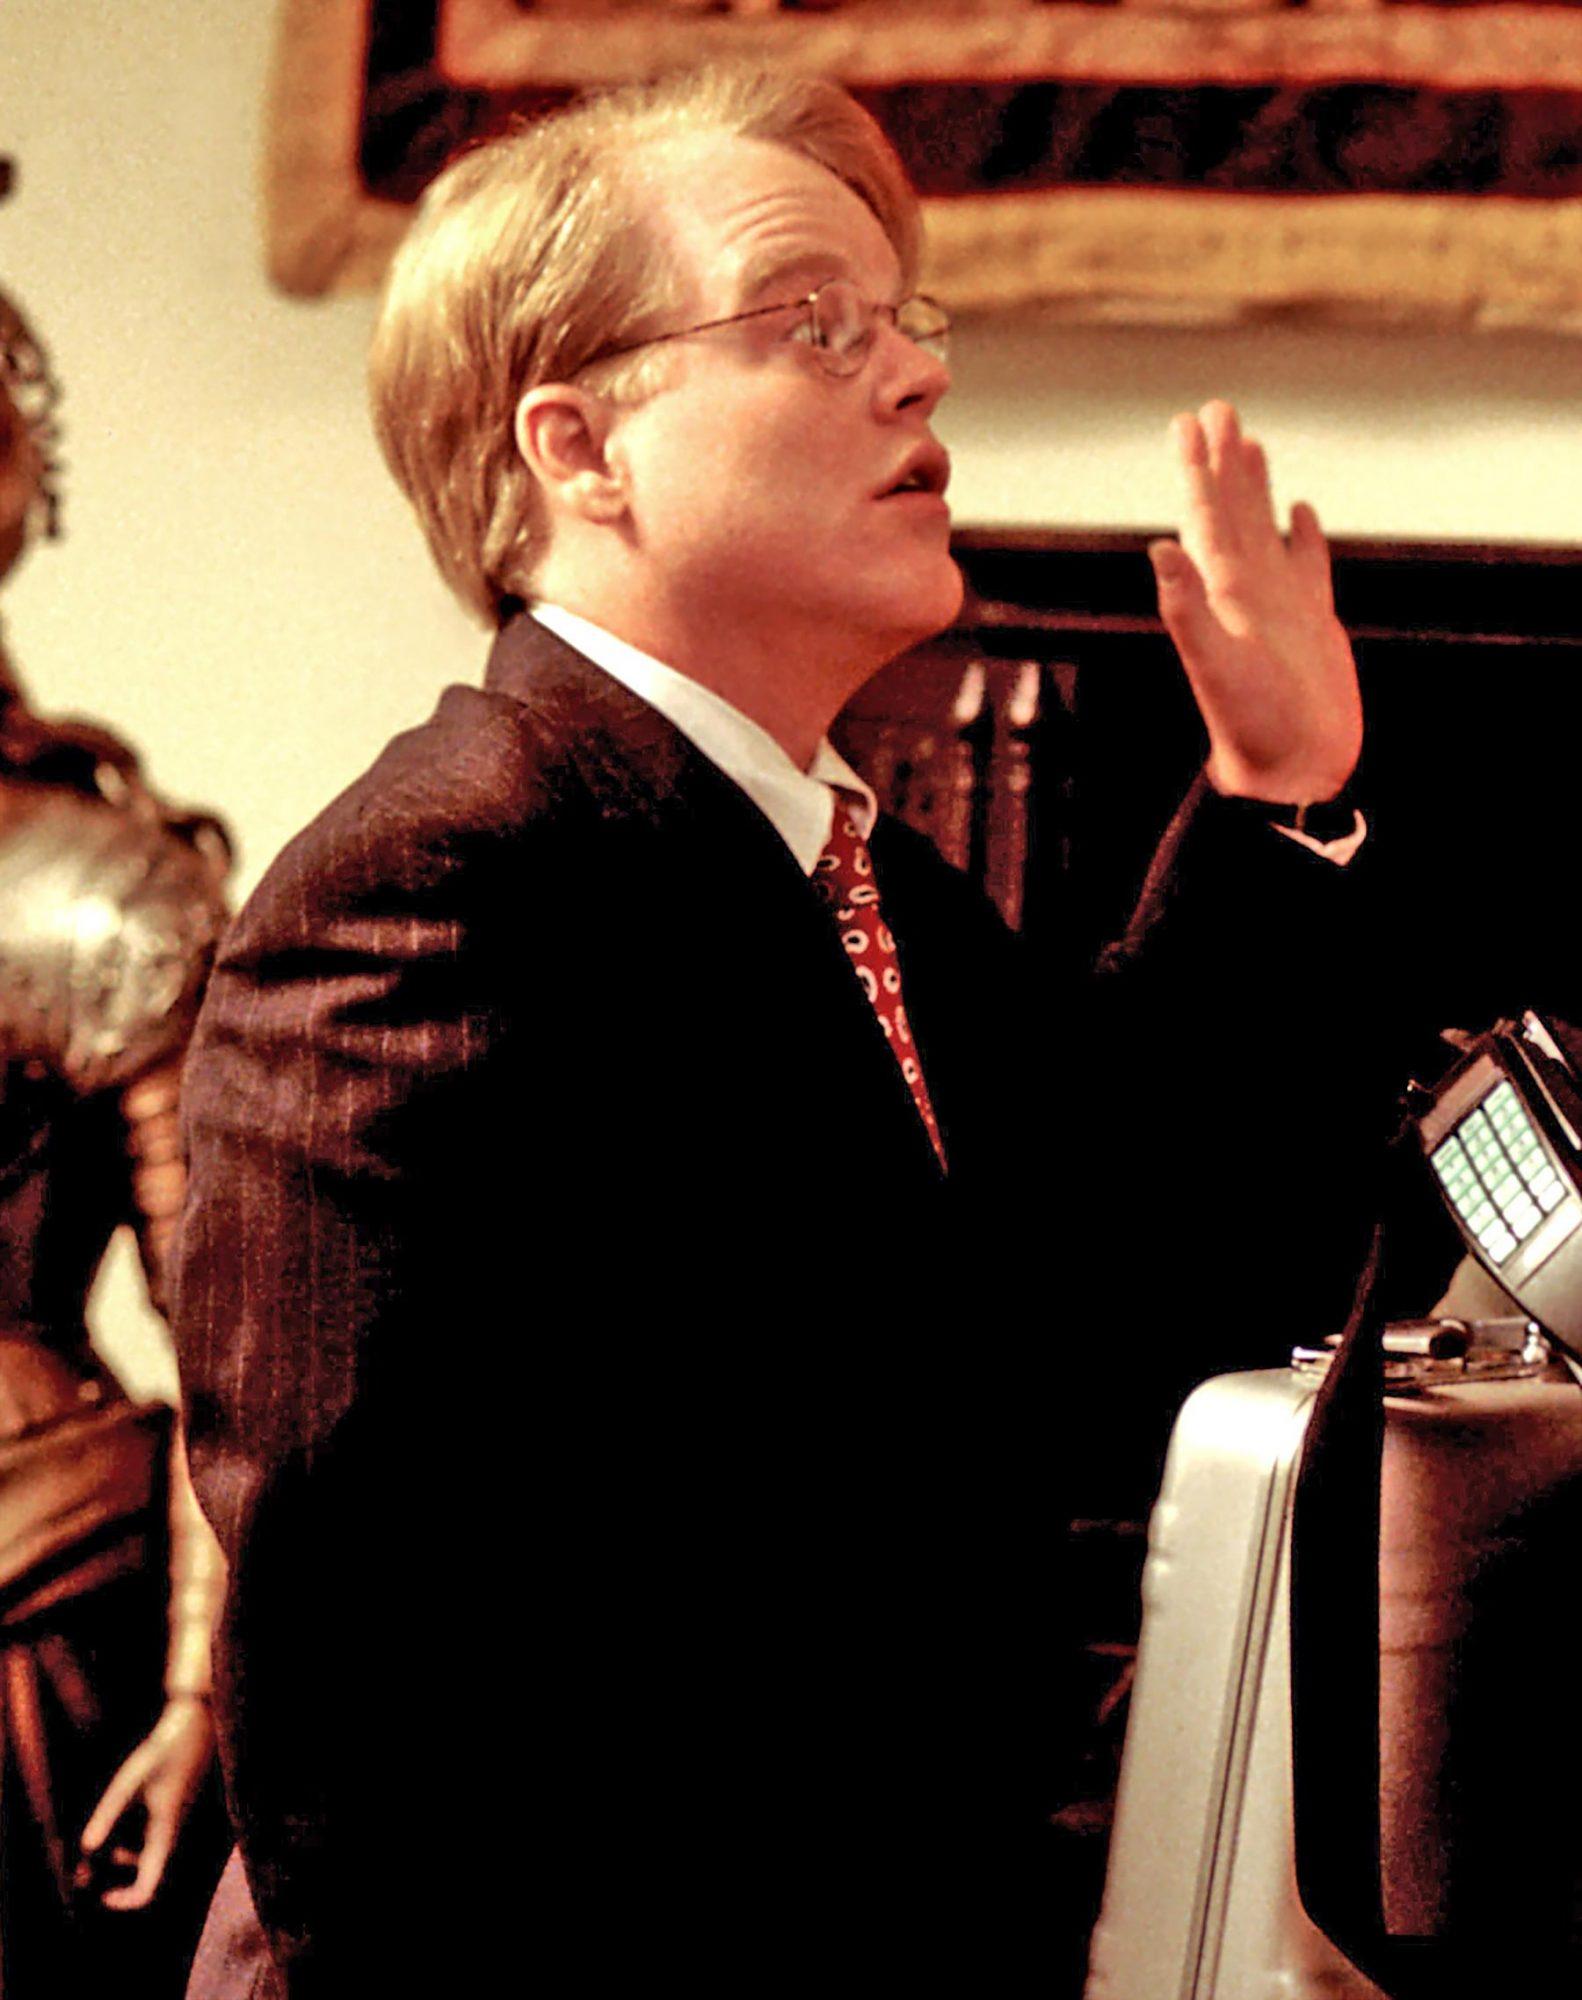 THE BIG LEBOWSKI, Philip Seymour Hoffman, Jeff Bridges, 1998, (c) Gramercy Pictures/courtesy Everett